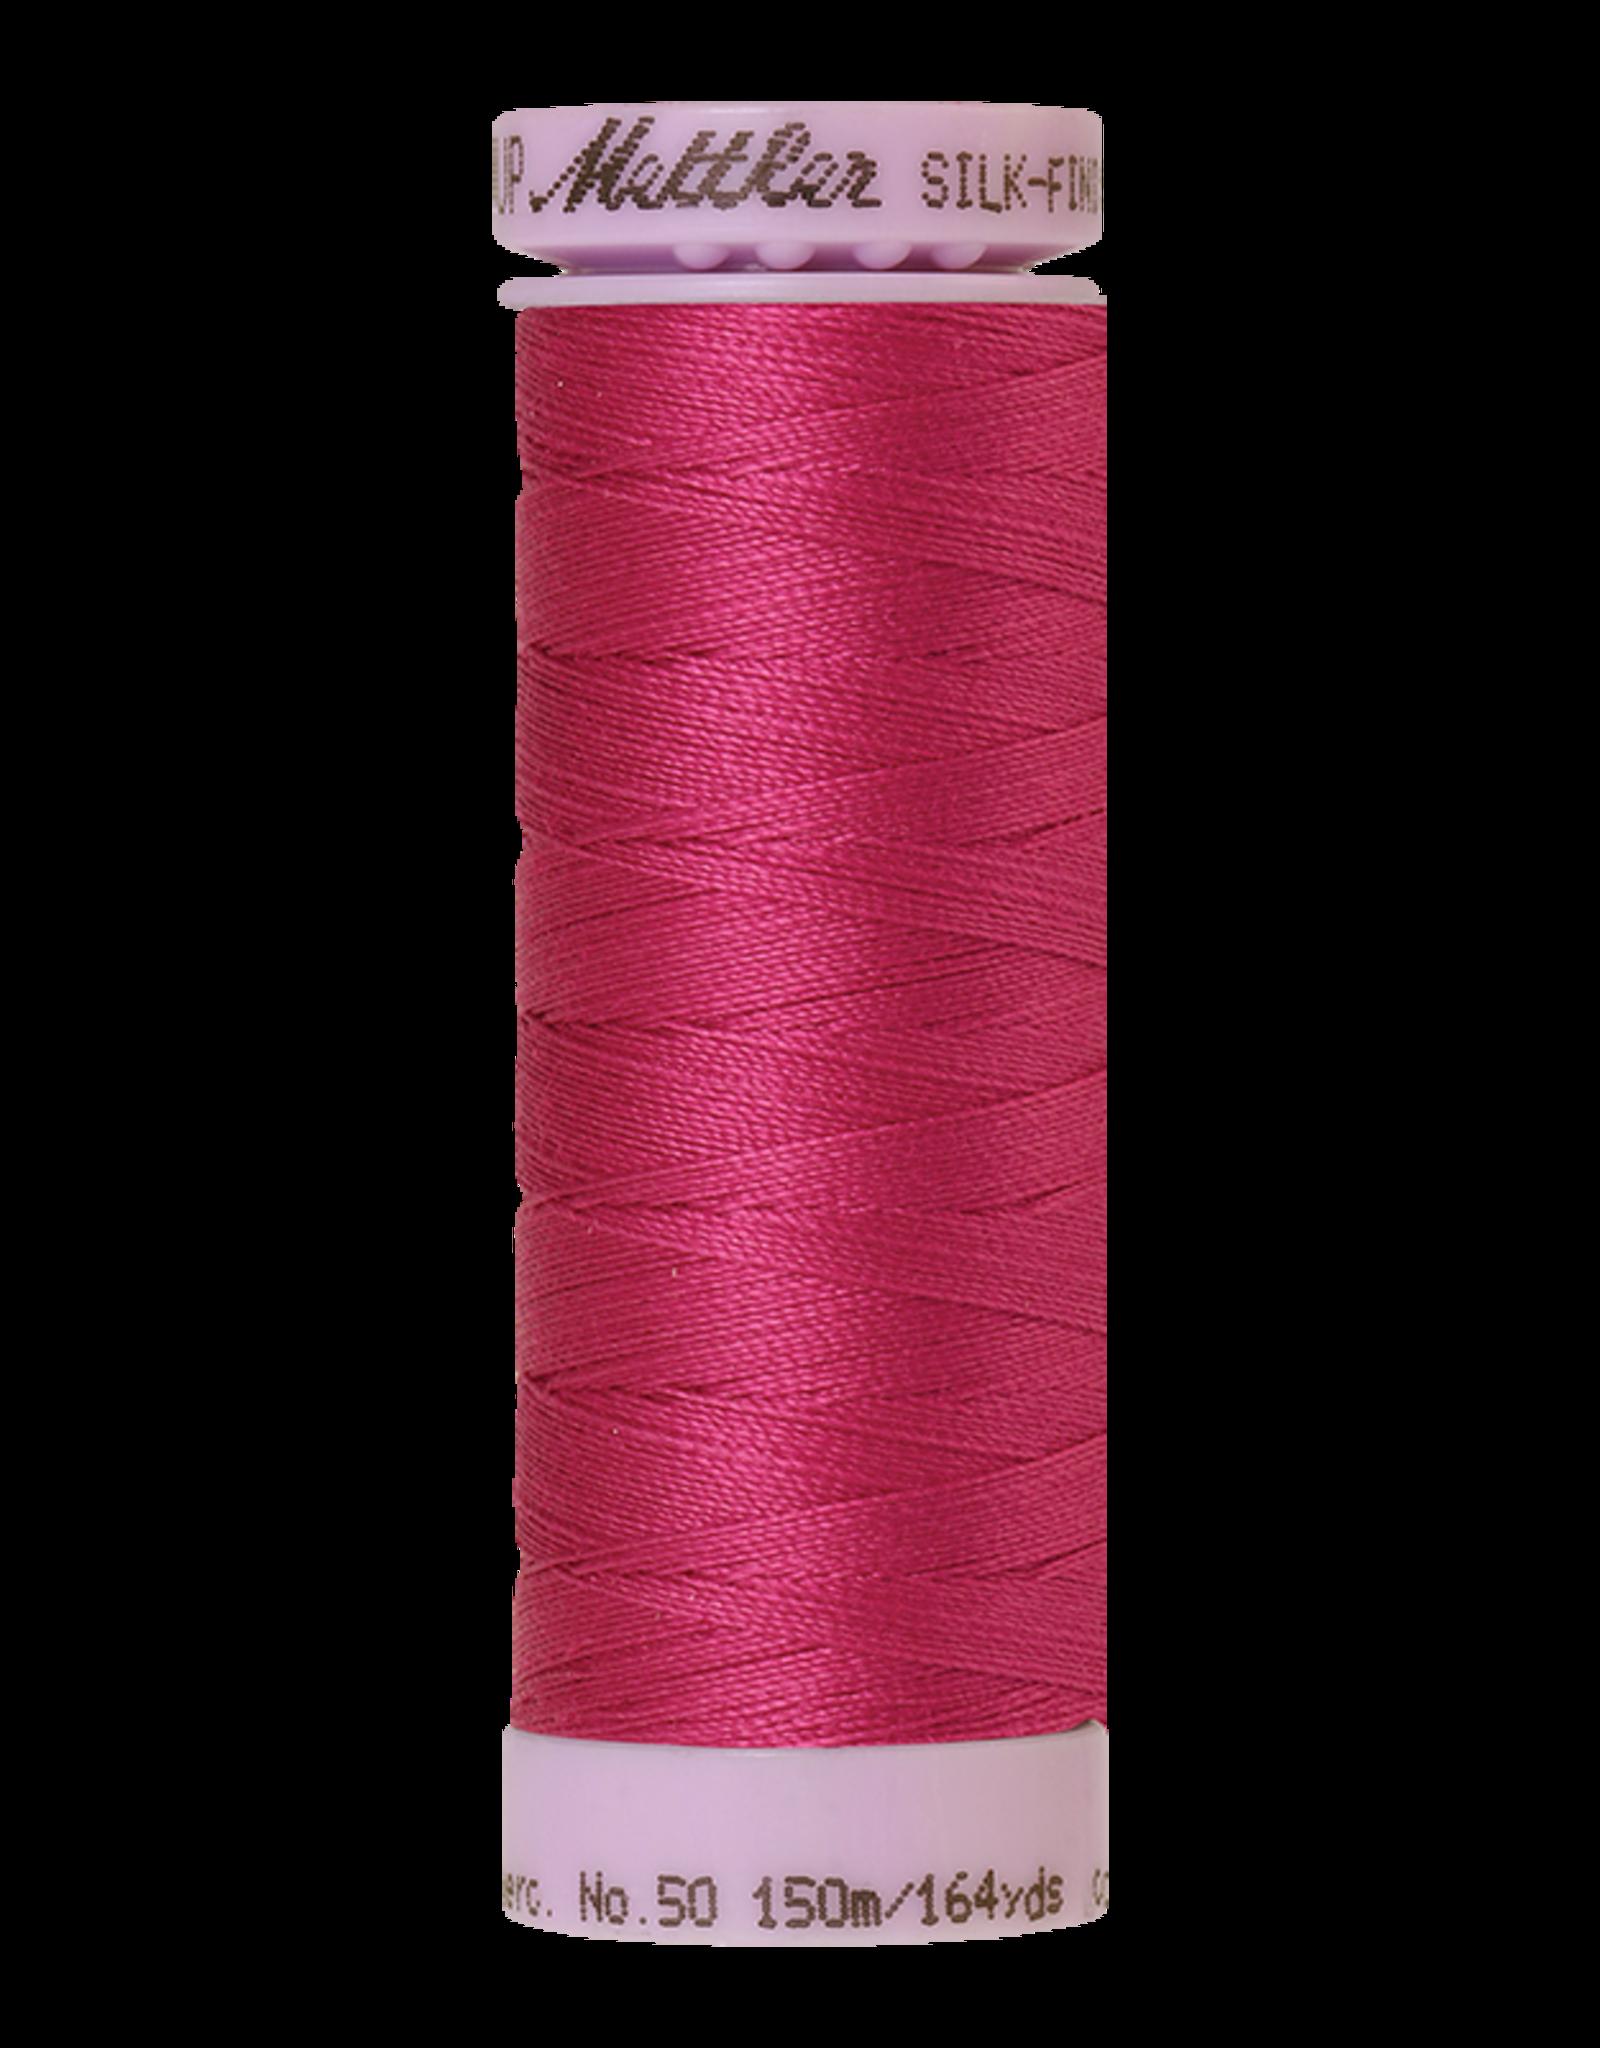 Mettler Silk Finish Cotton 50 - 150 meter - 1417